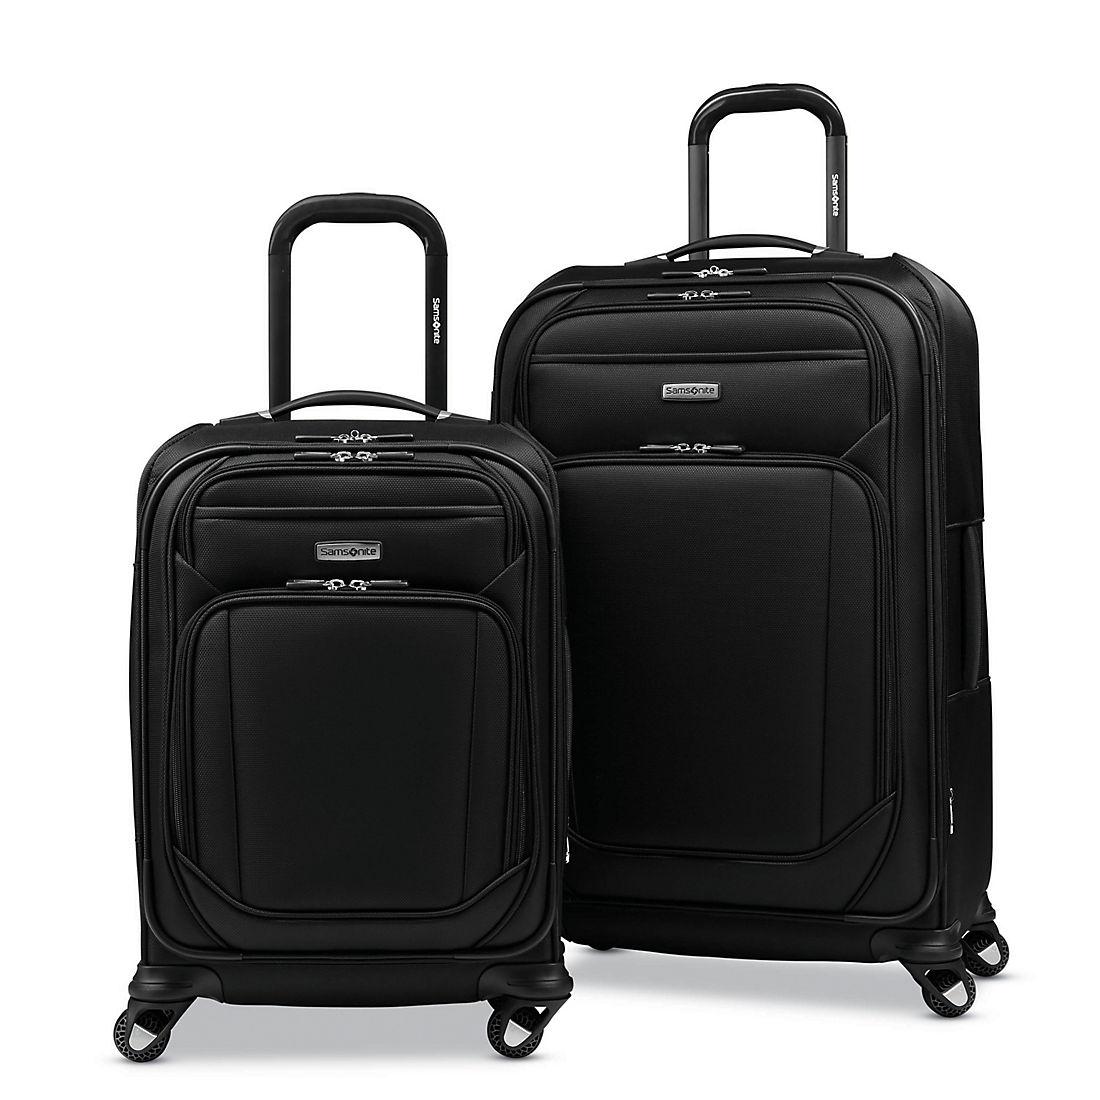 96aace6fb212 Samsonite Sphere 2-Pc. Softside Luggage Set - Black